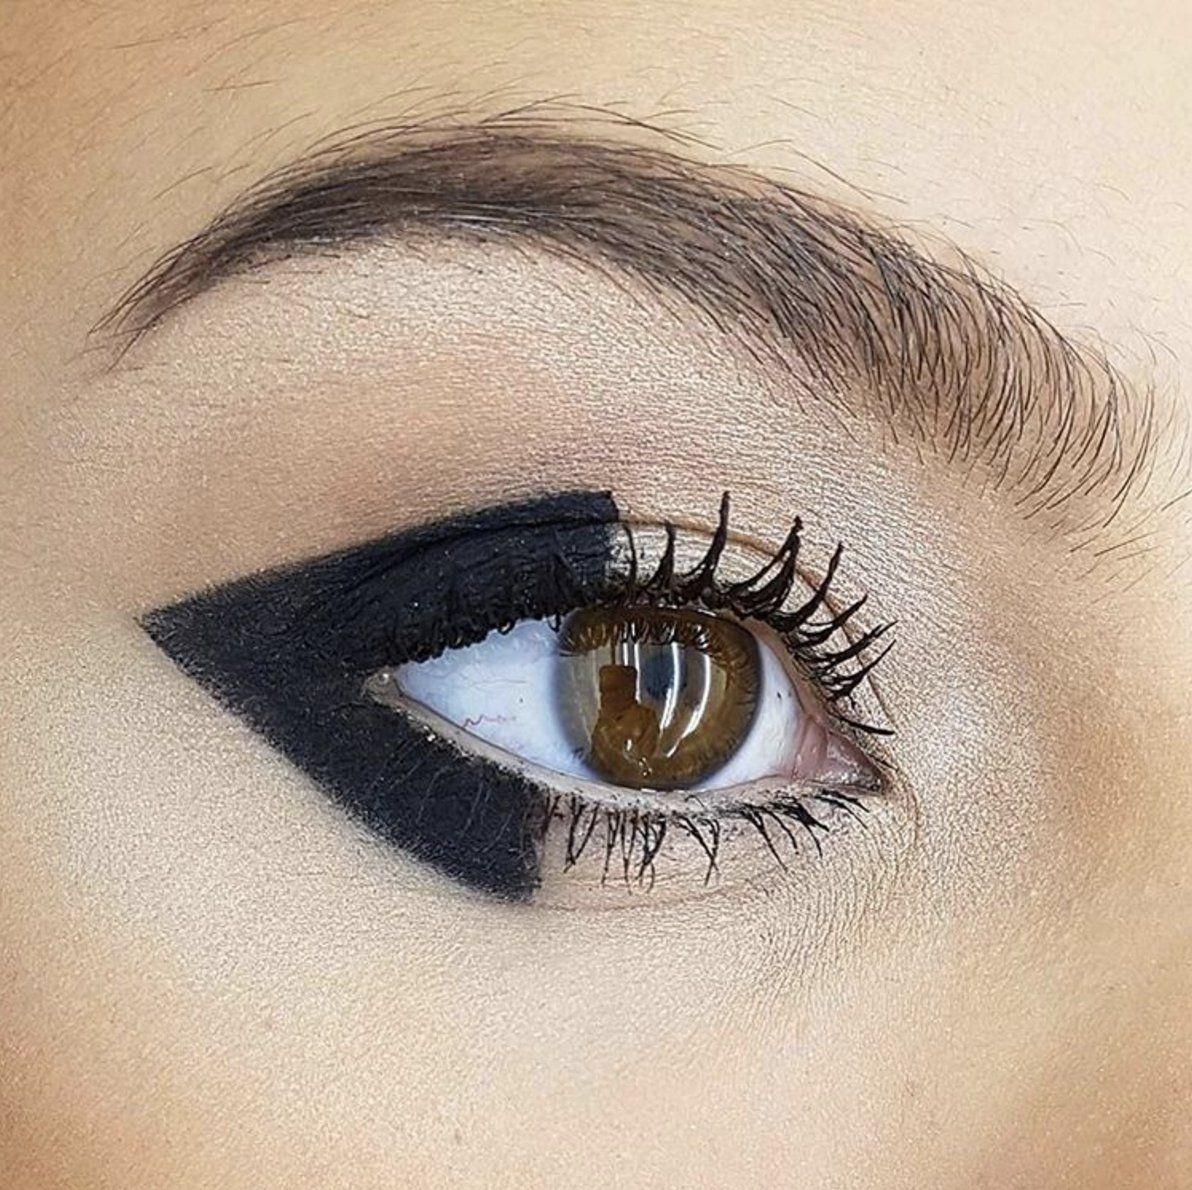 13 photos Instagram de MAC Cosmetics pour inspirer votre